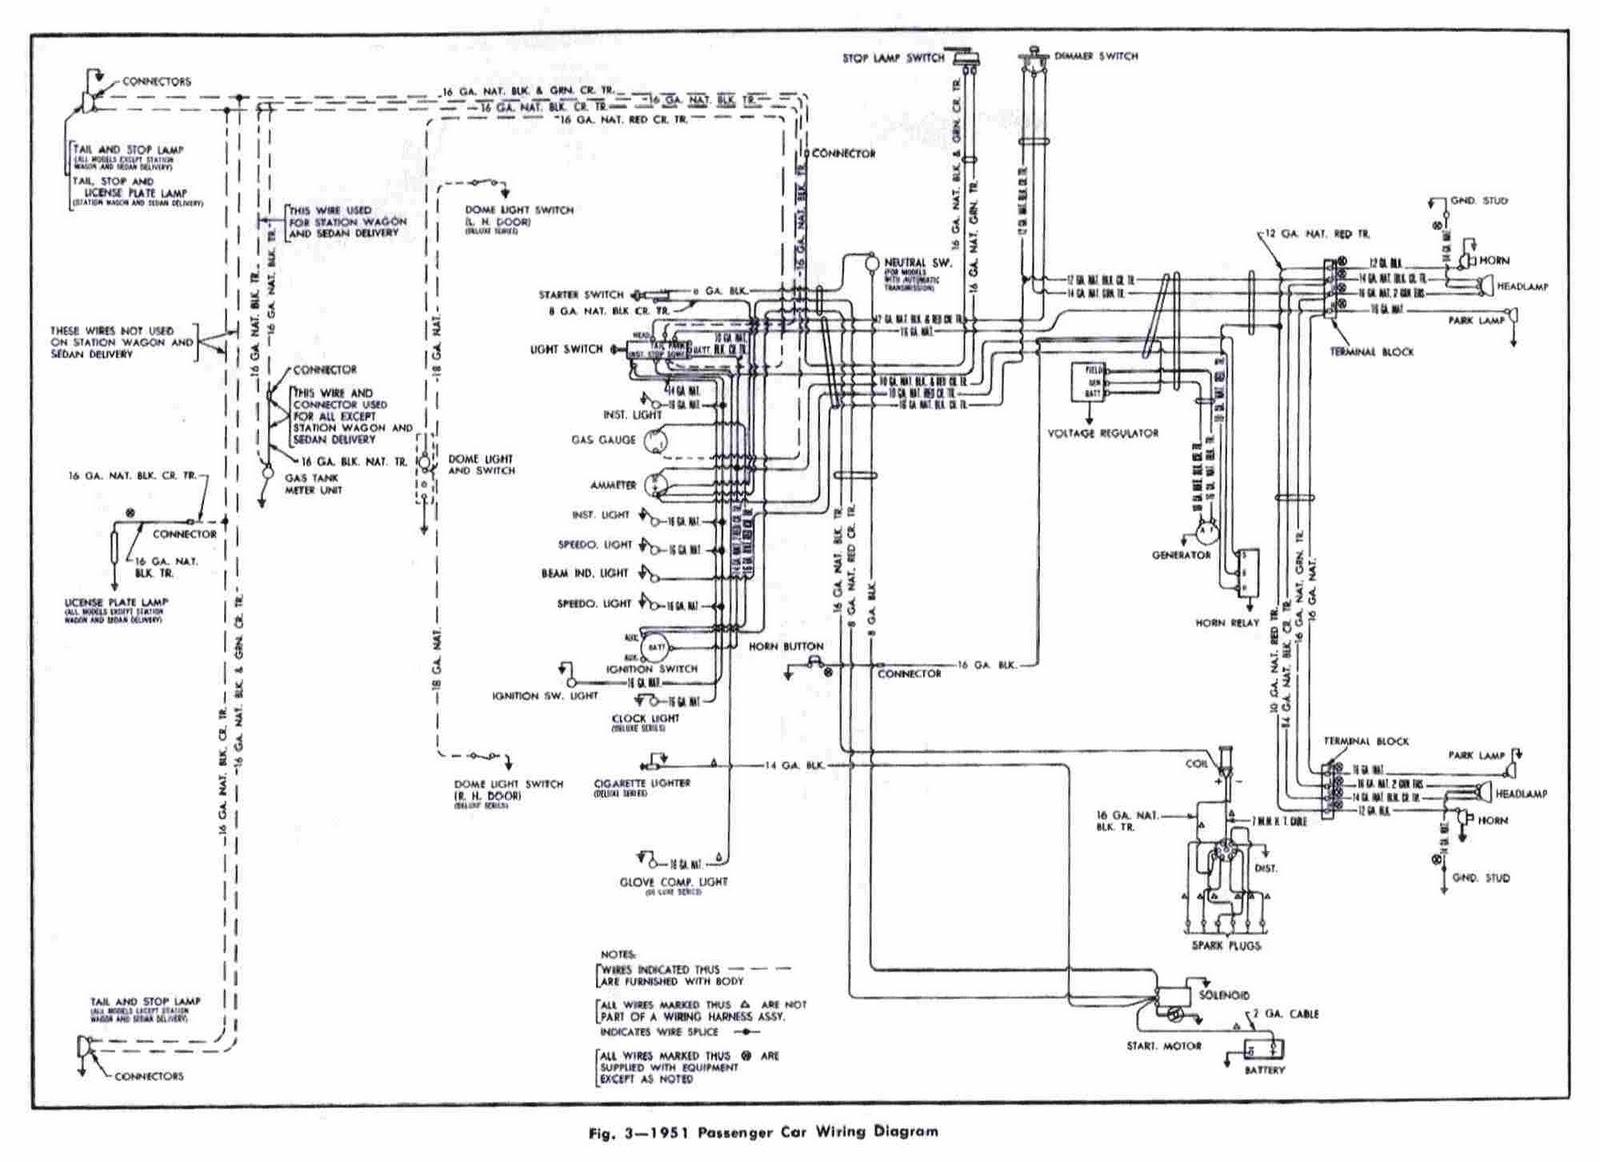 1951 Lincoln Wiring Diagram Wiring Diagram